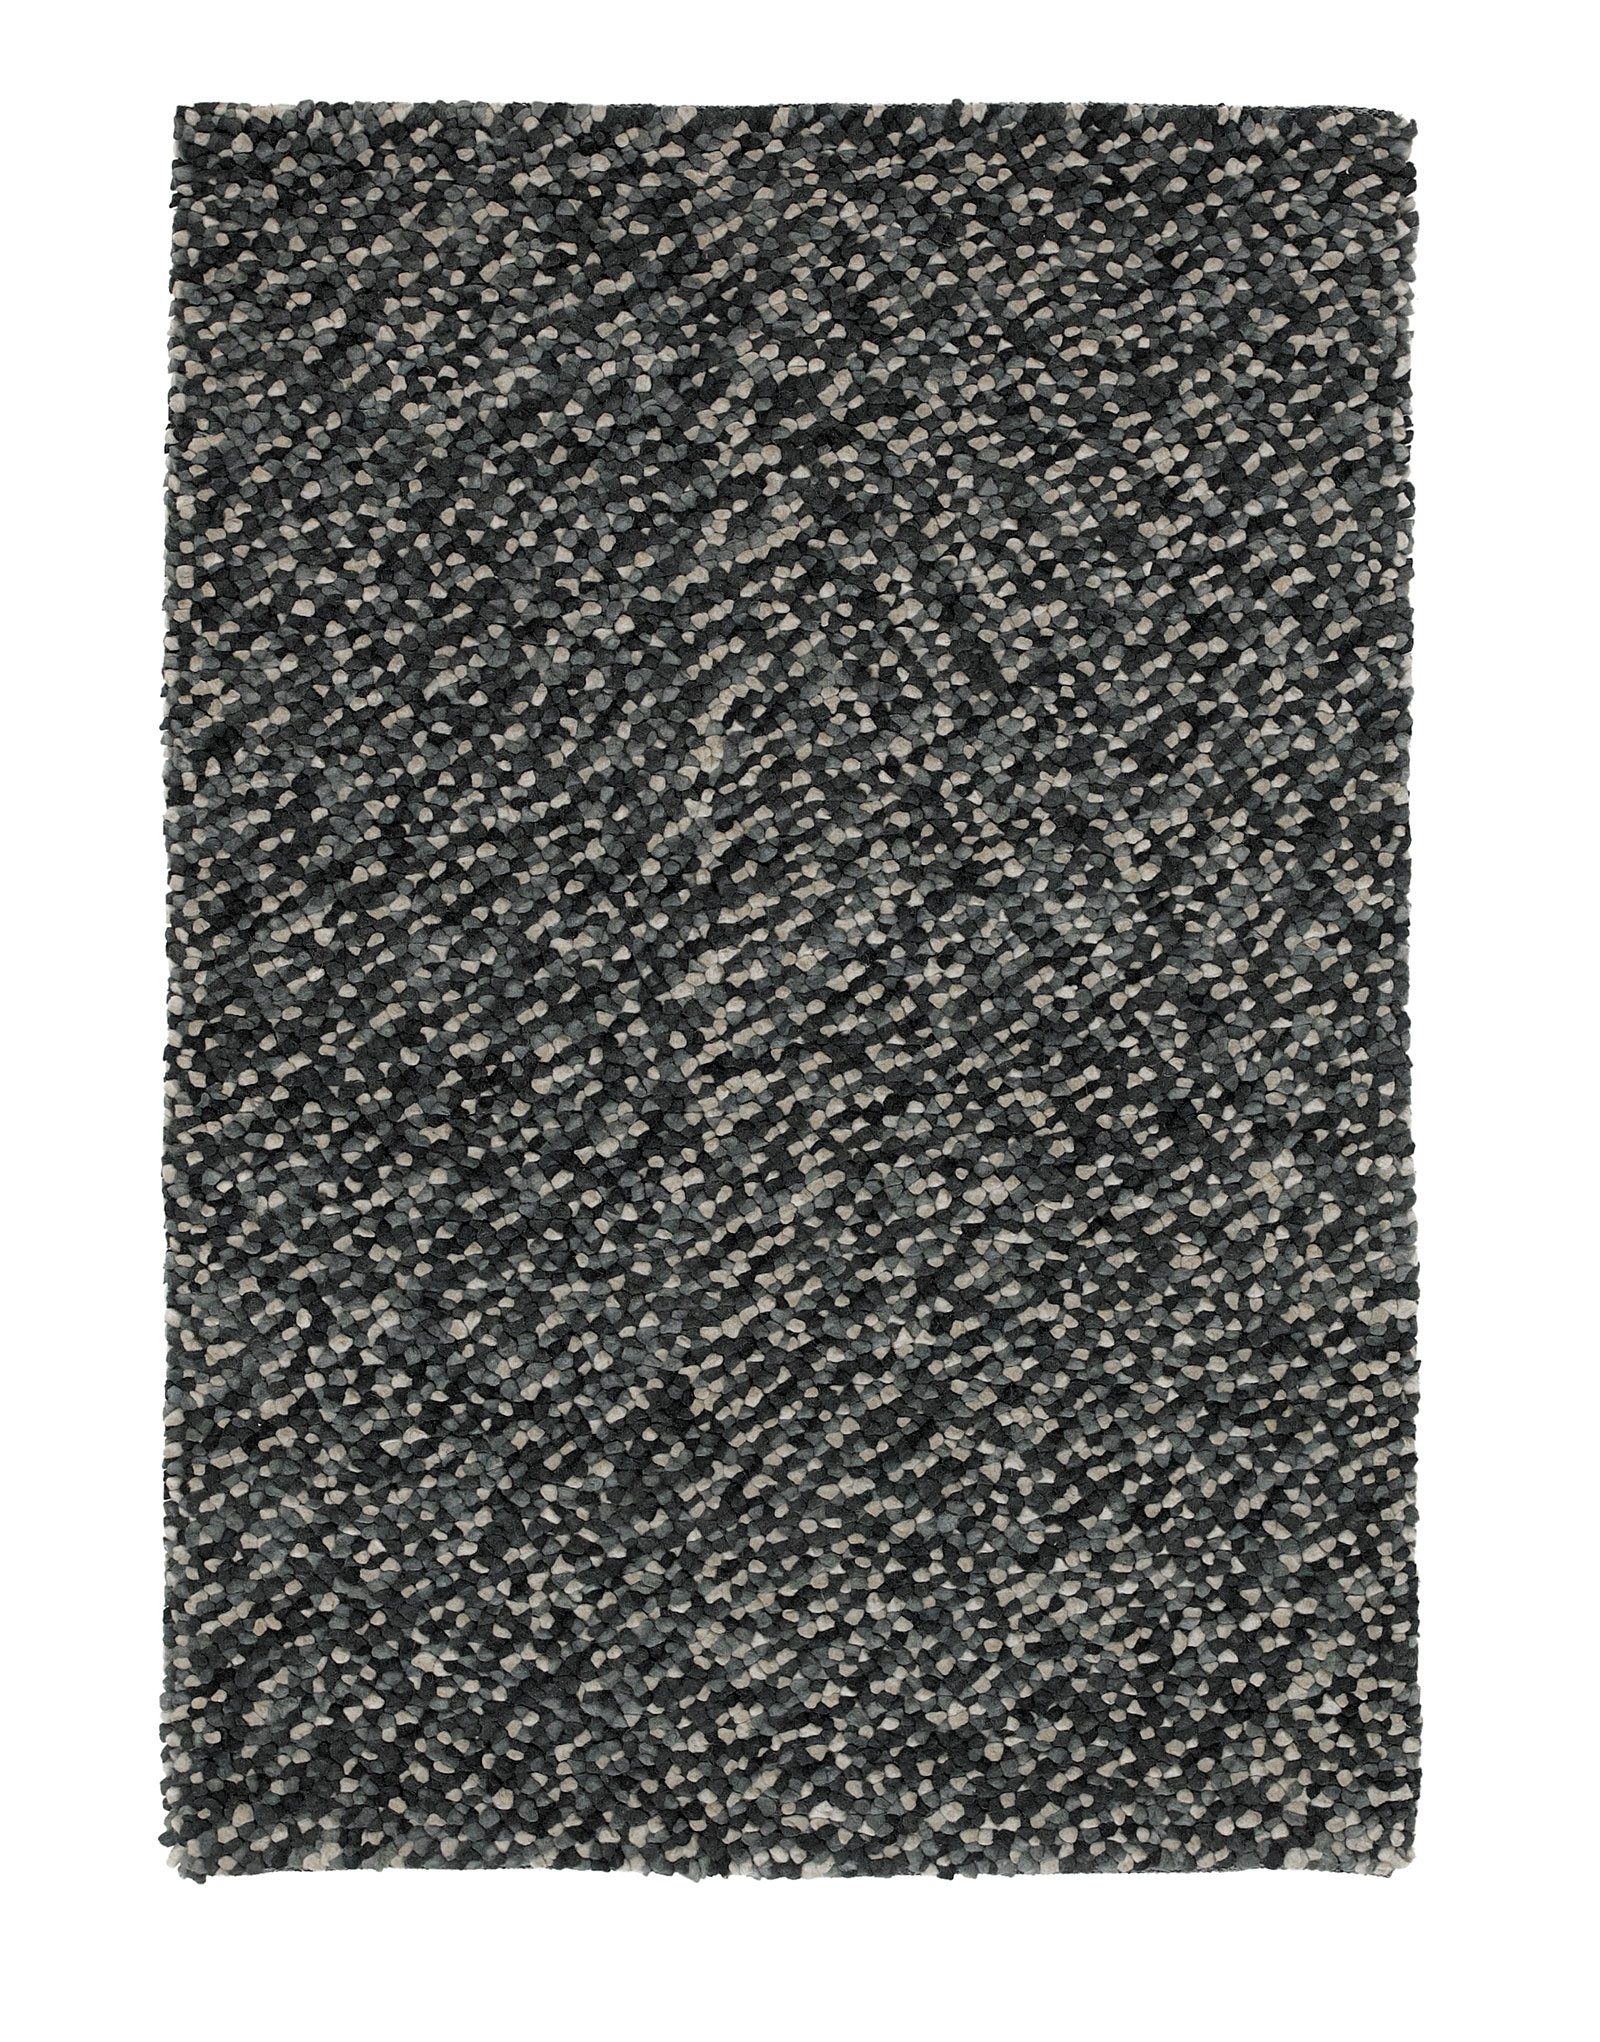 Pebbles-Grey-_1.jpg